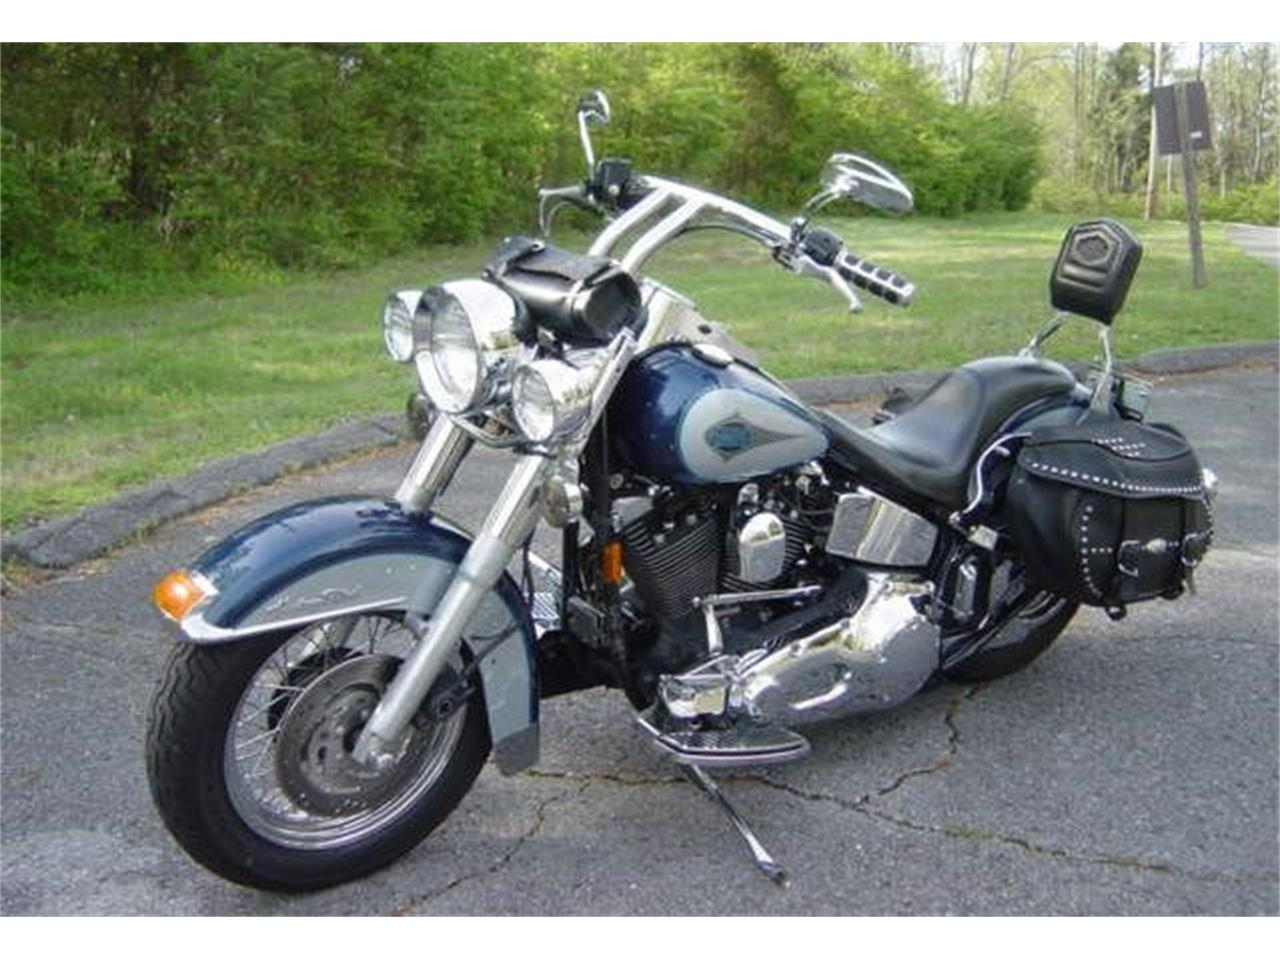 For Sale: 1999 Harley-Davidson Heritage in Hendersonville, Tennessee